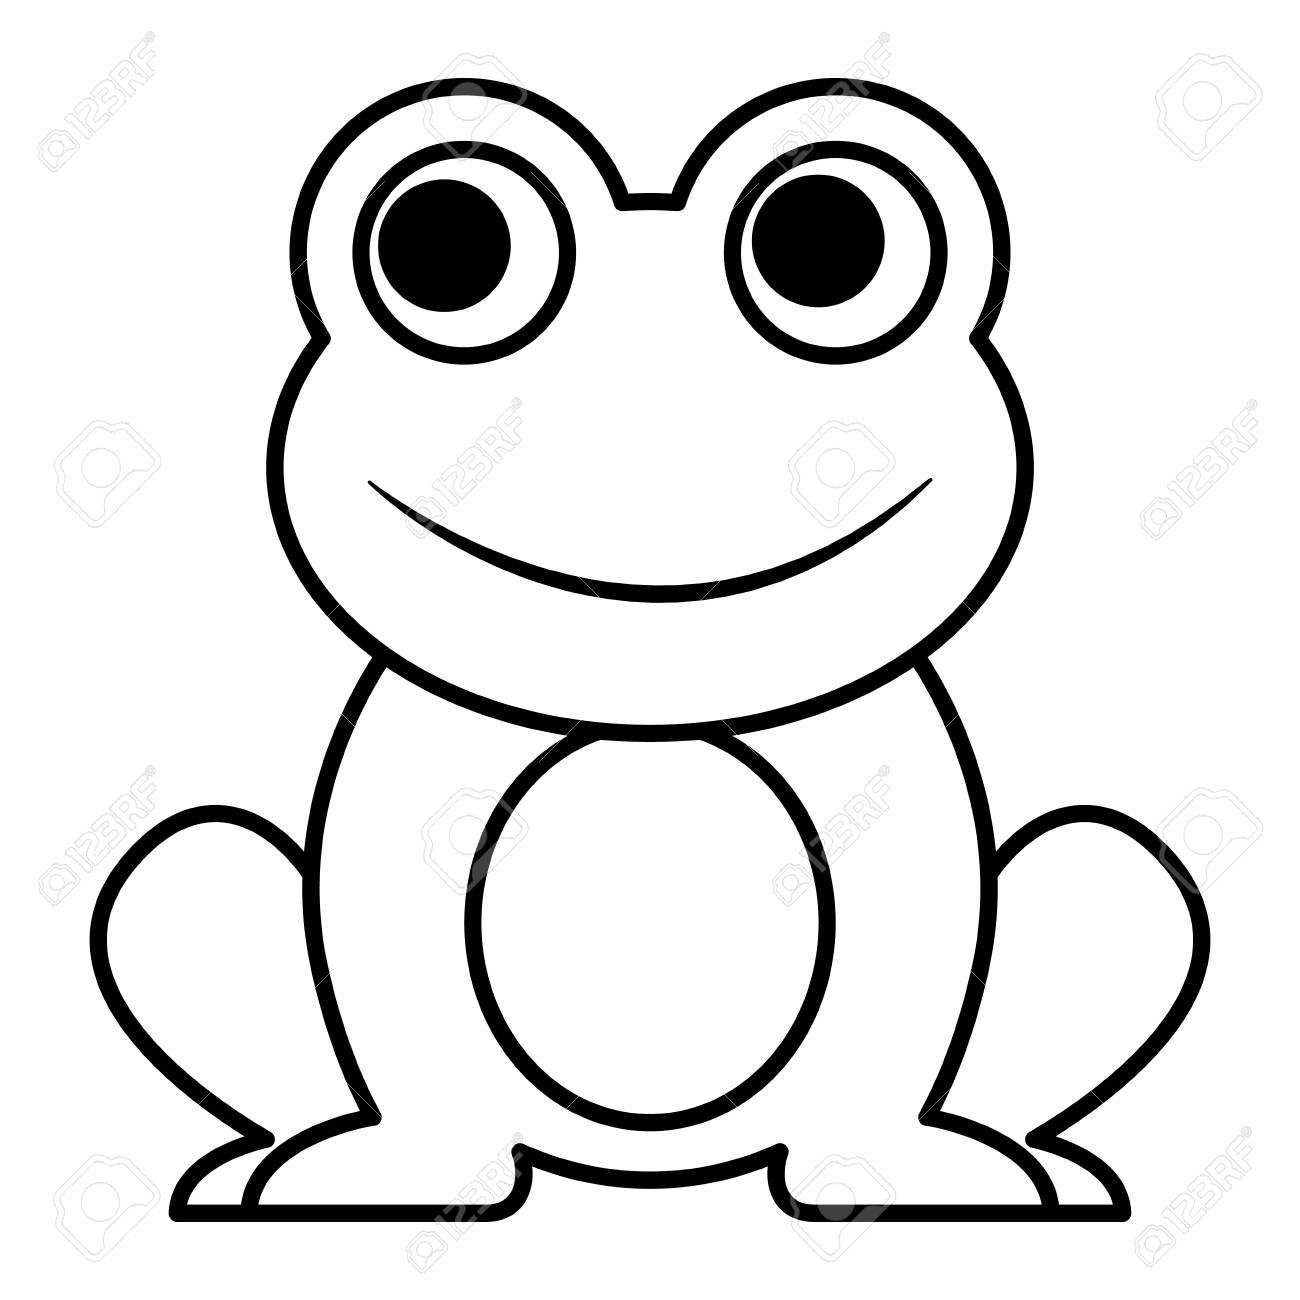 frog cute animal sitting cartoon vector illustration outline rh 123rf com Frog Silhouette Vector Simple Frog Drawing